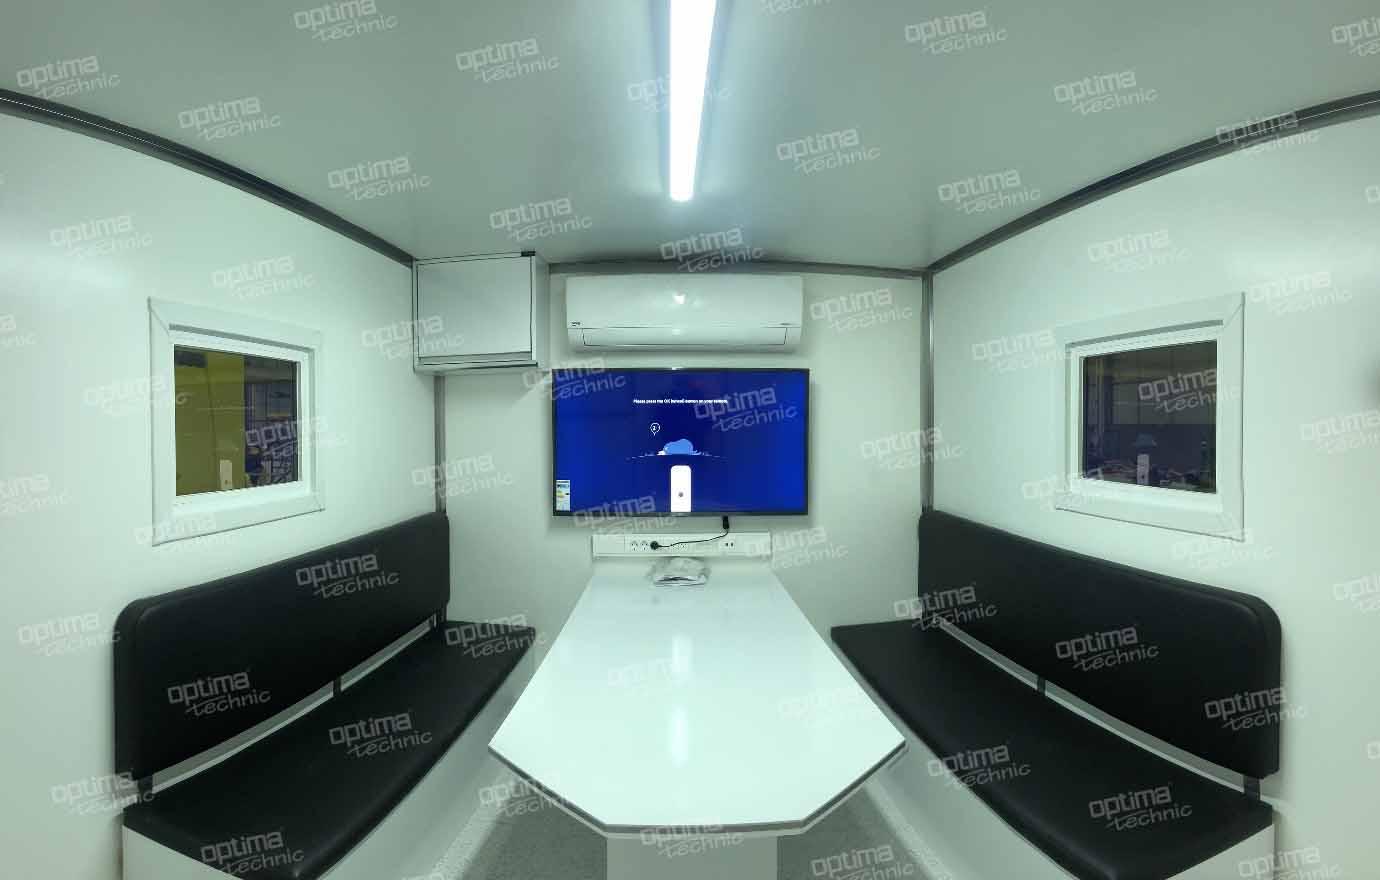 Mobile Command & Control Drawbar